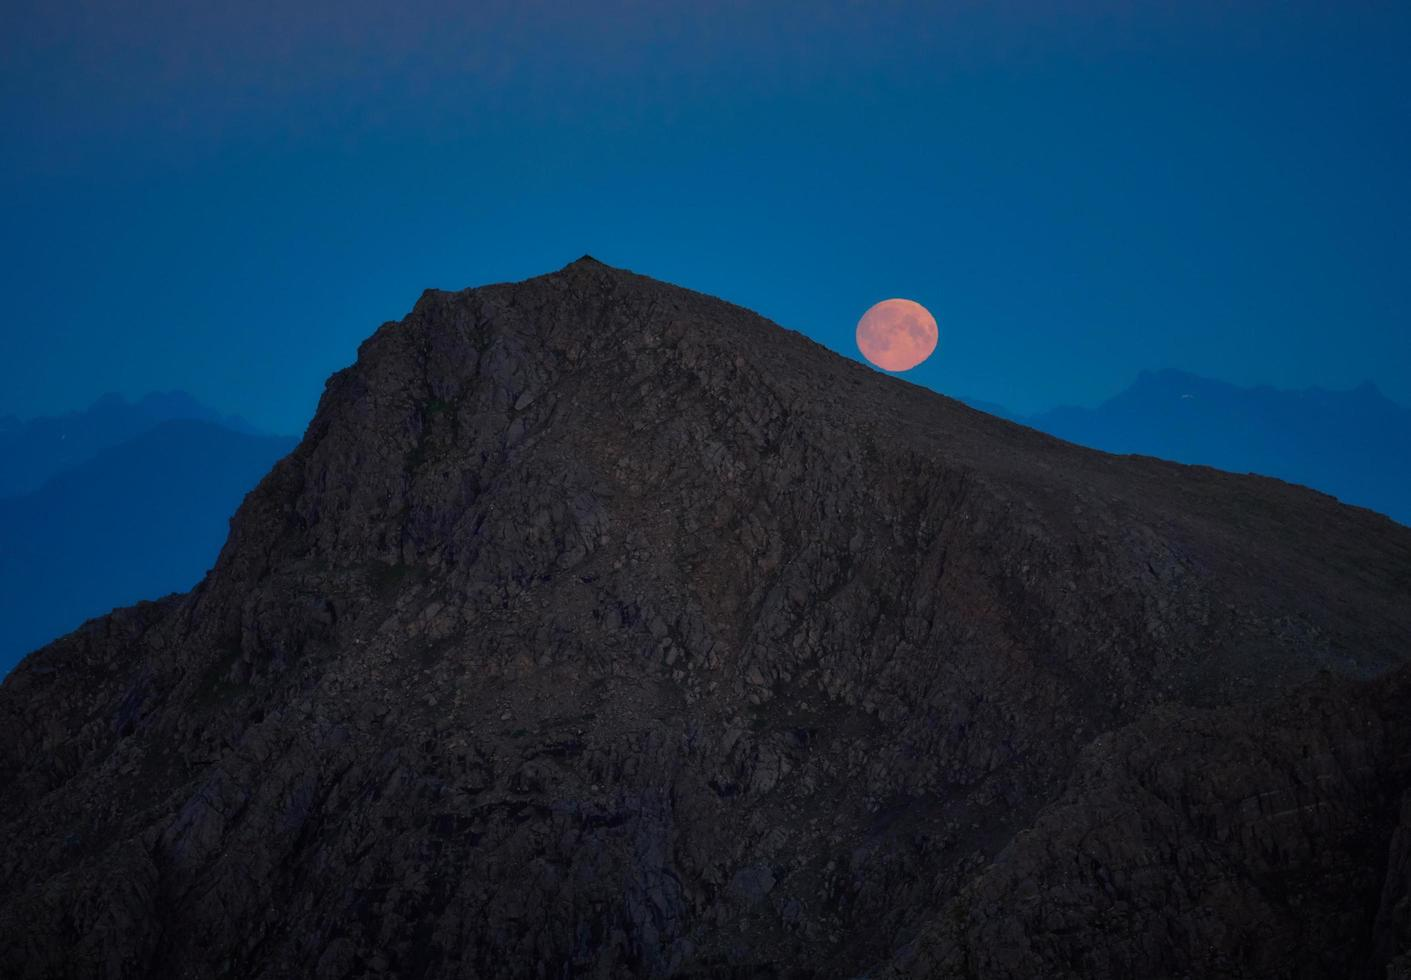 Brown mountain during nighttime photo